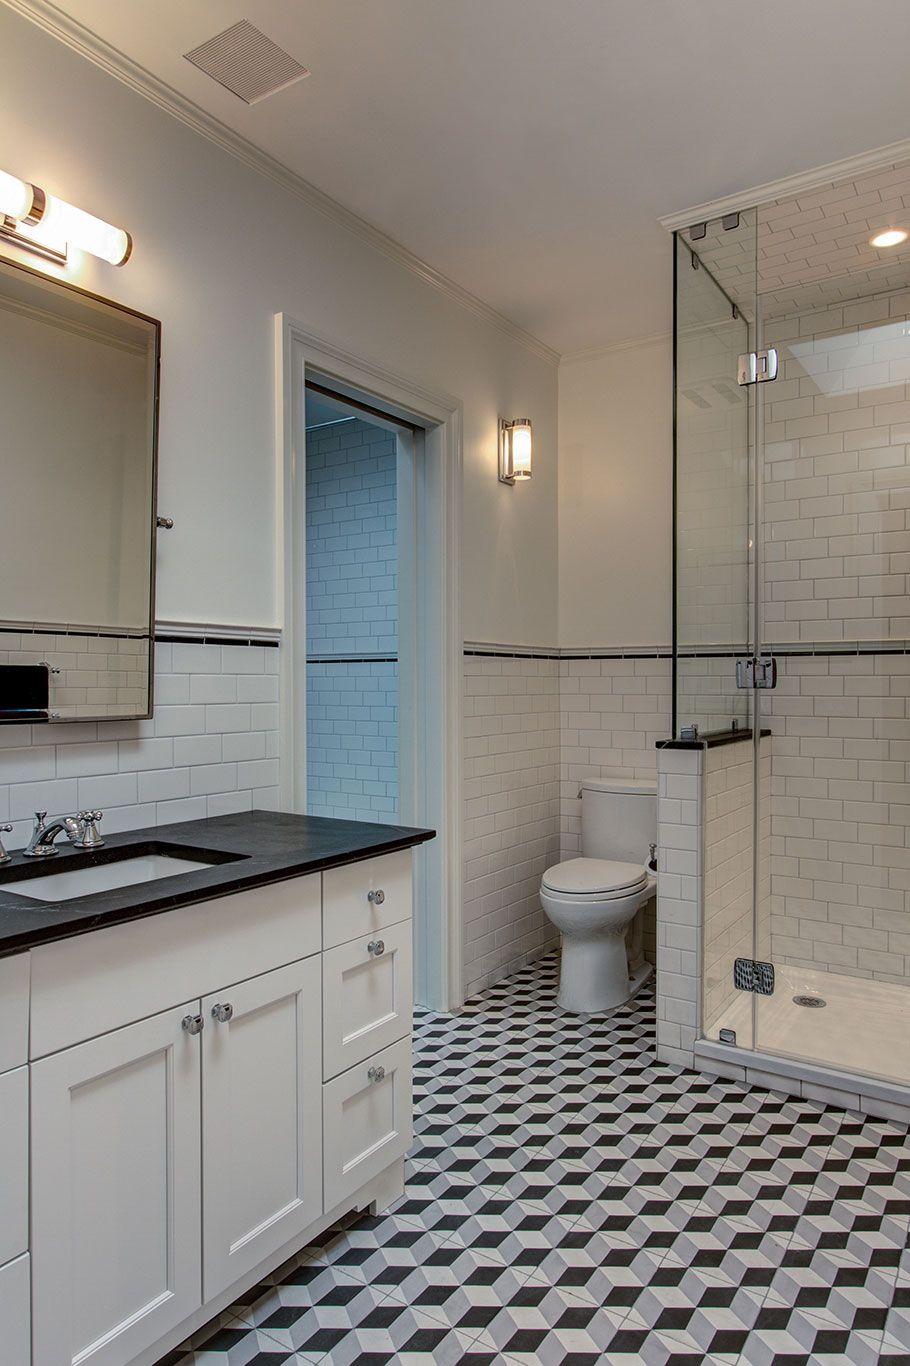 Attrayant Bathroom In Brooklyn Townhouse Renovation. Ben Herzog, Architect.